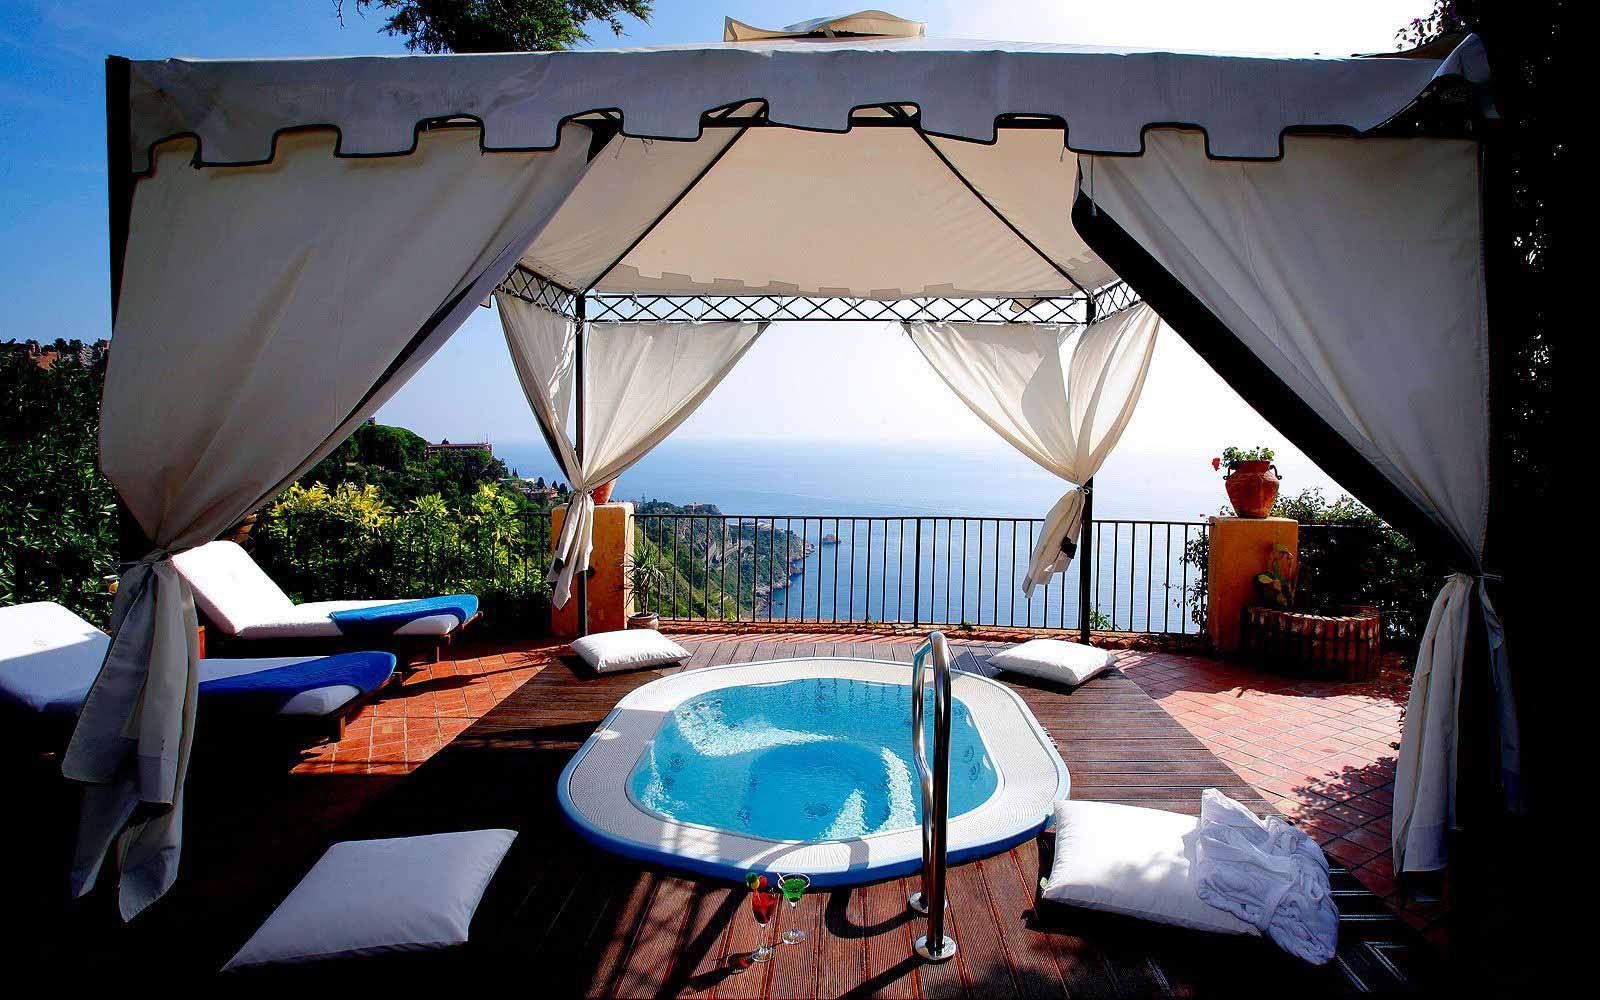 Garden suite terraces at San Domenico Palace Hotel